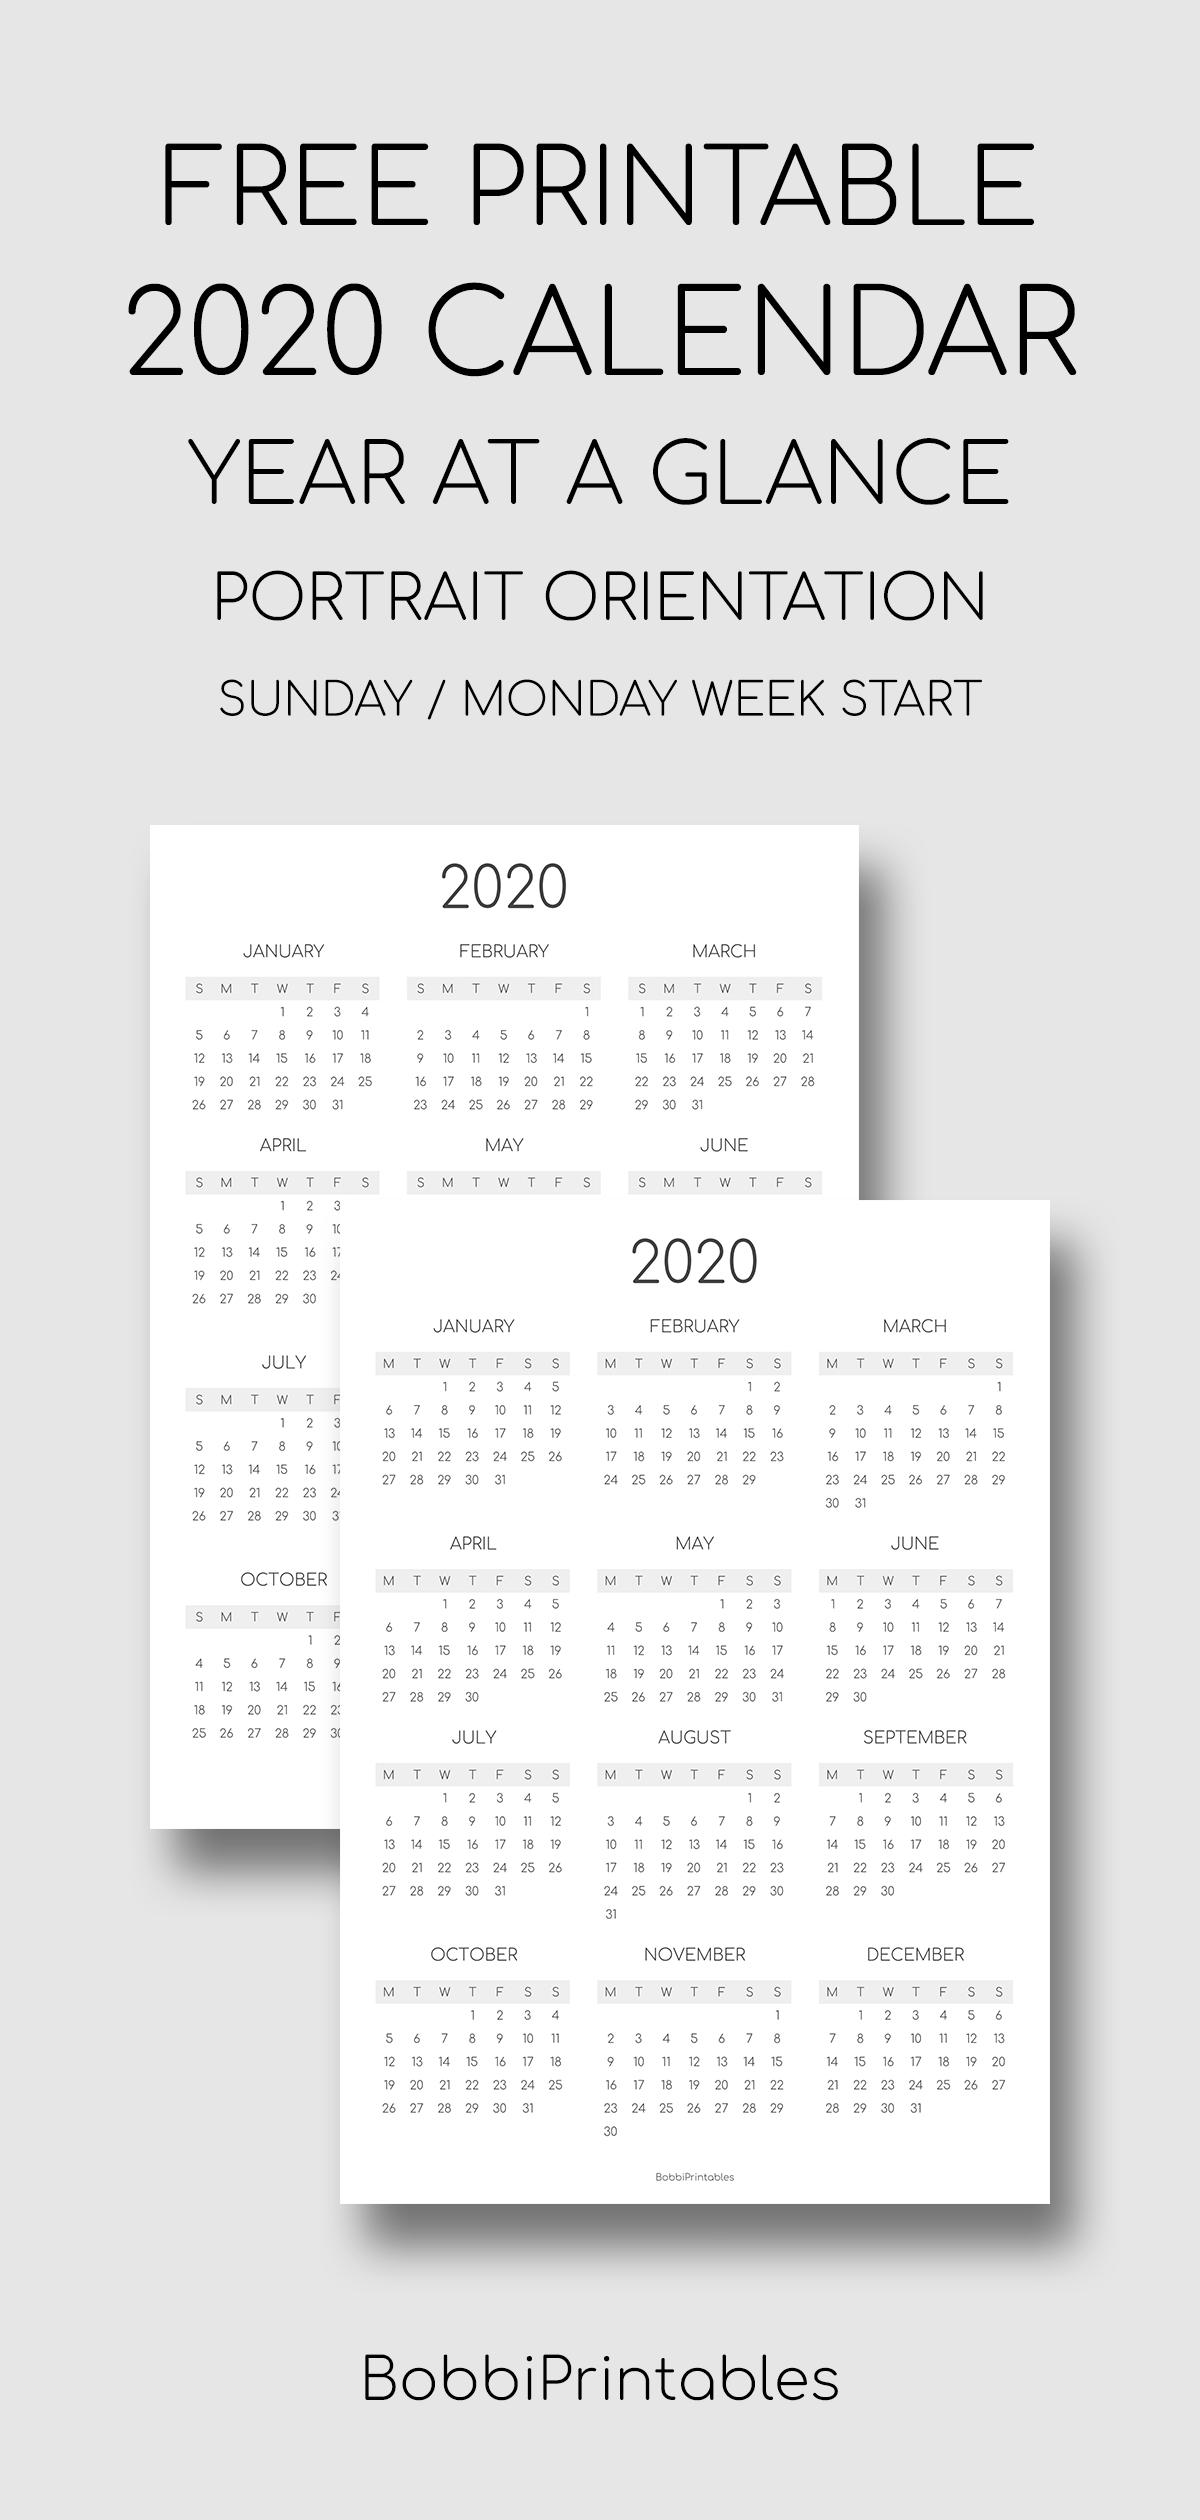 Printable 2020 Calendar - Portrait | At A Glance Calendar pertaining to Year At A Glance 2020 Calendar